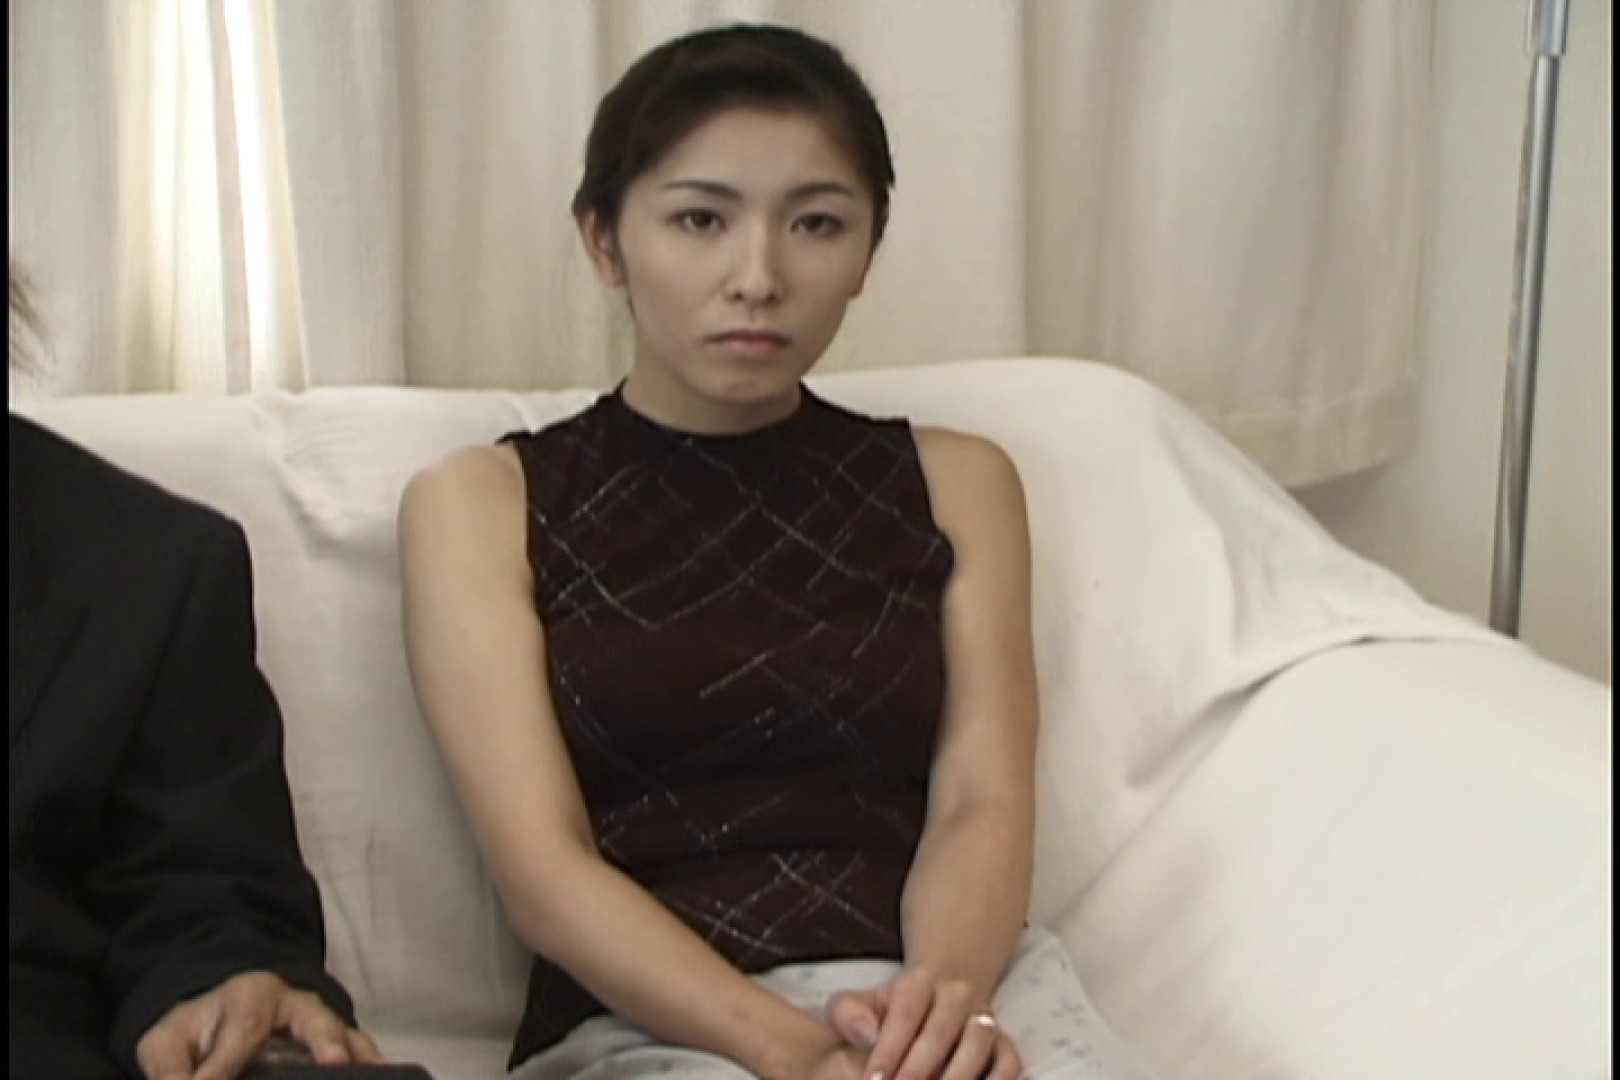 昼間の奥様は欲求不満 ~安田弘美~ 人妻  35連発 7